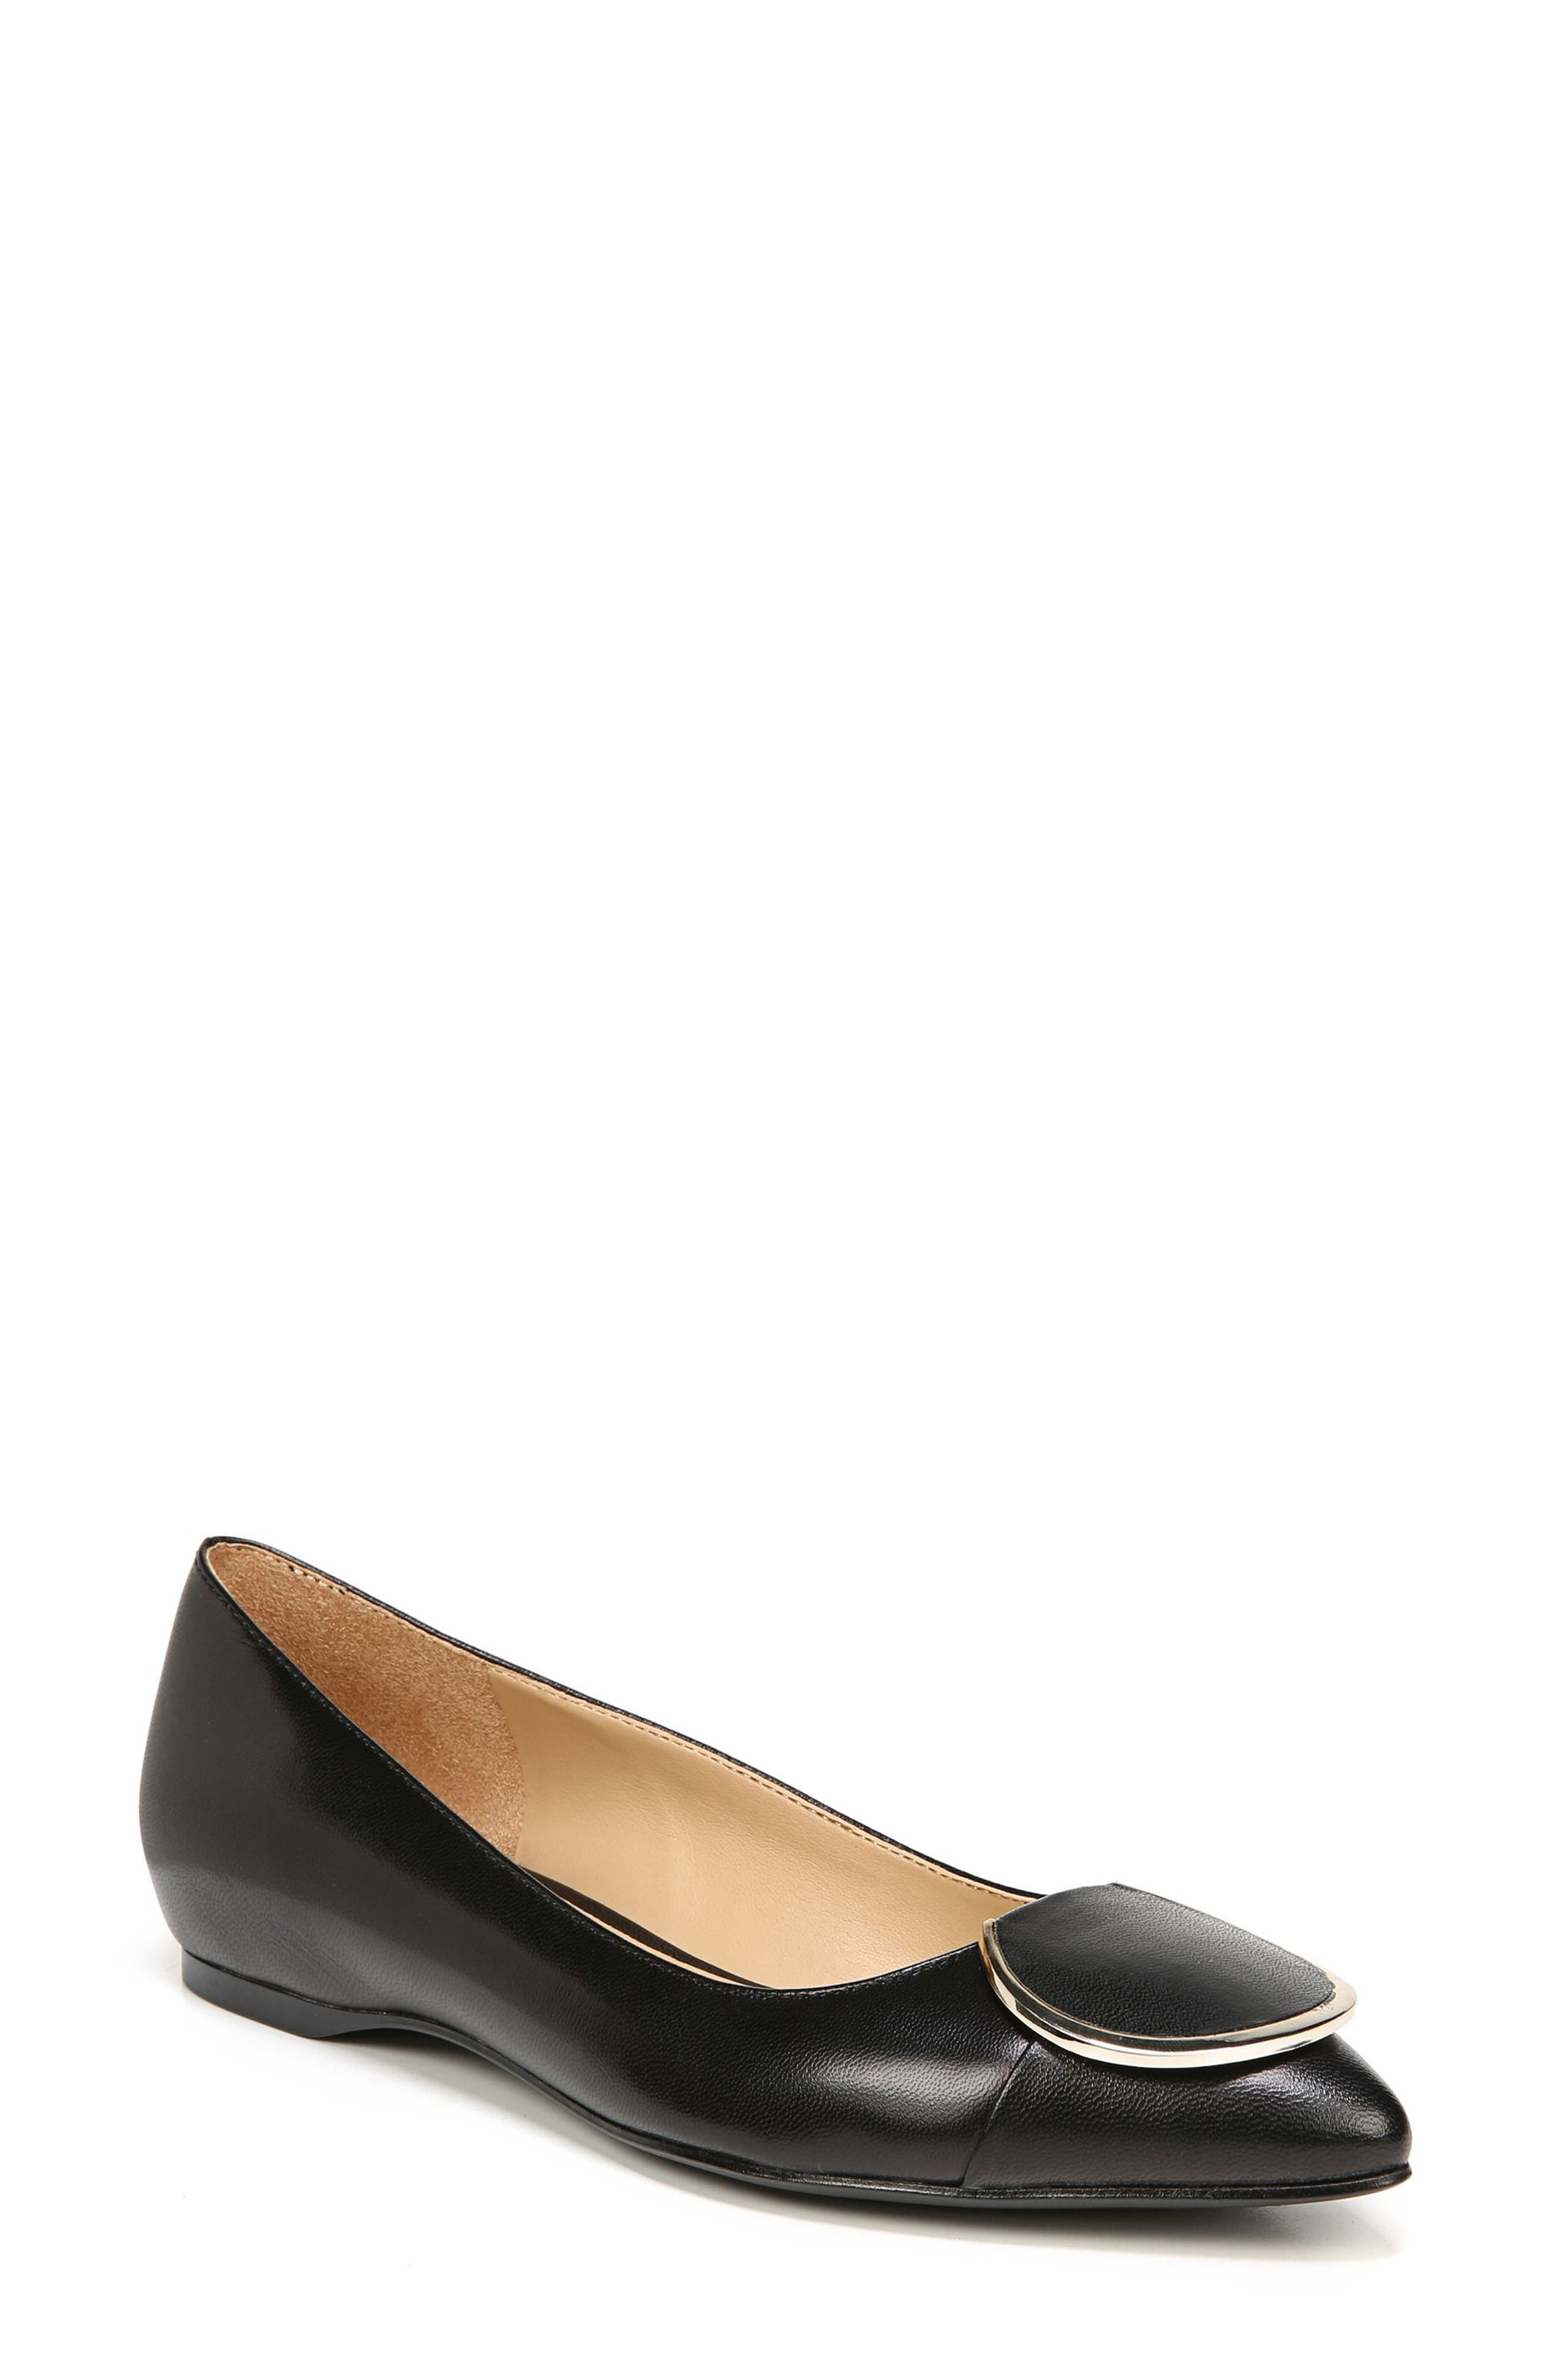 Stella Flat,                             Main thumbnail 1, color,                             Black Leather